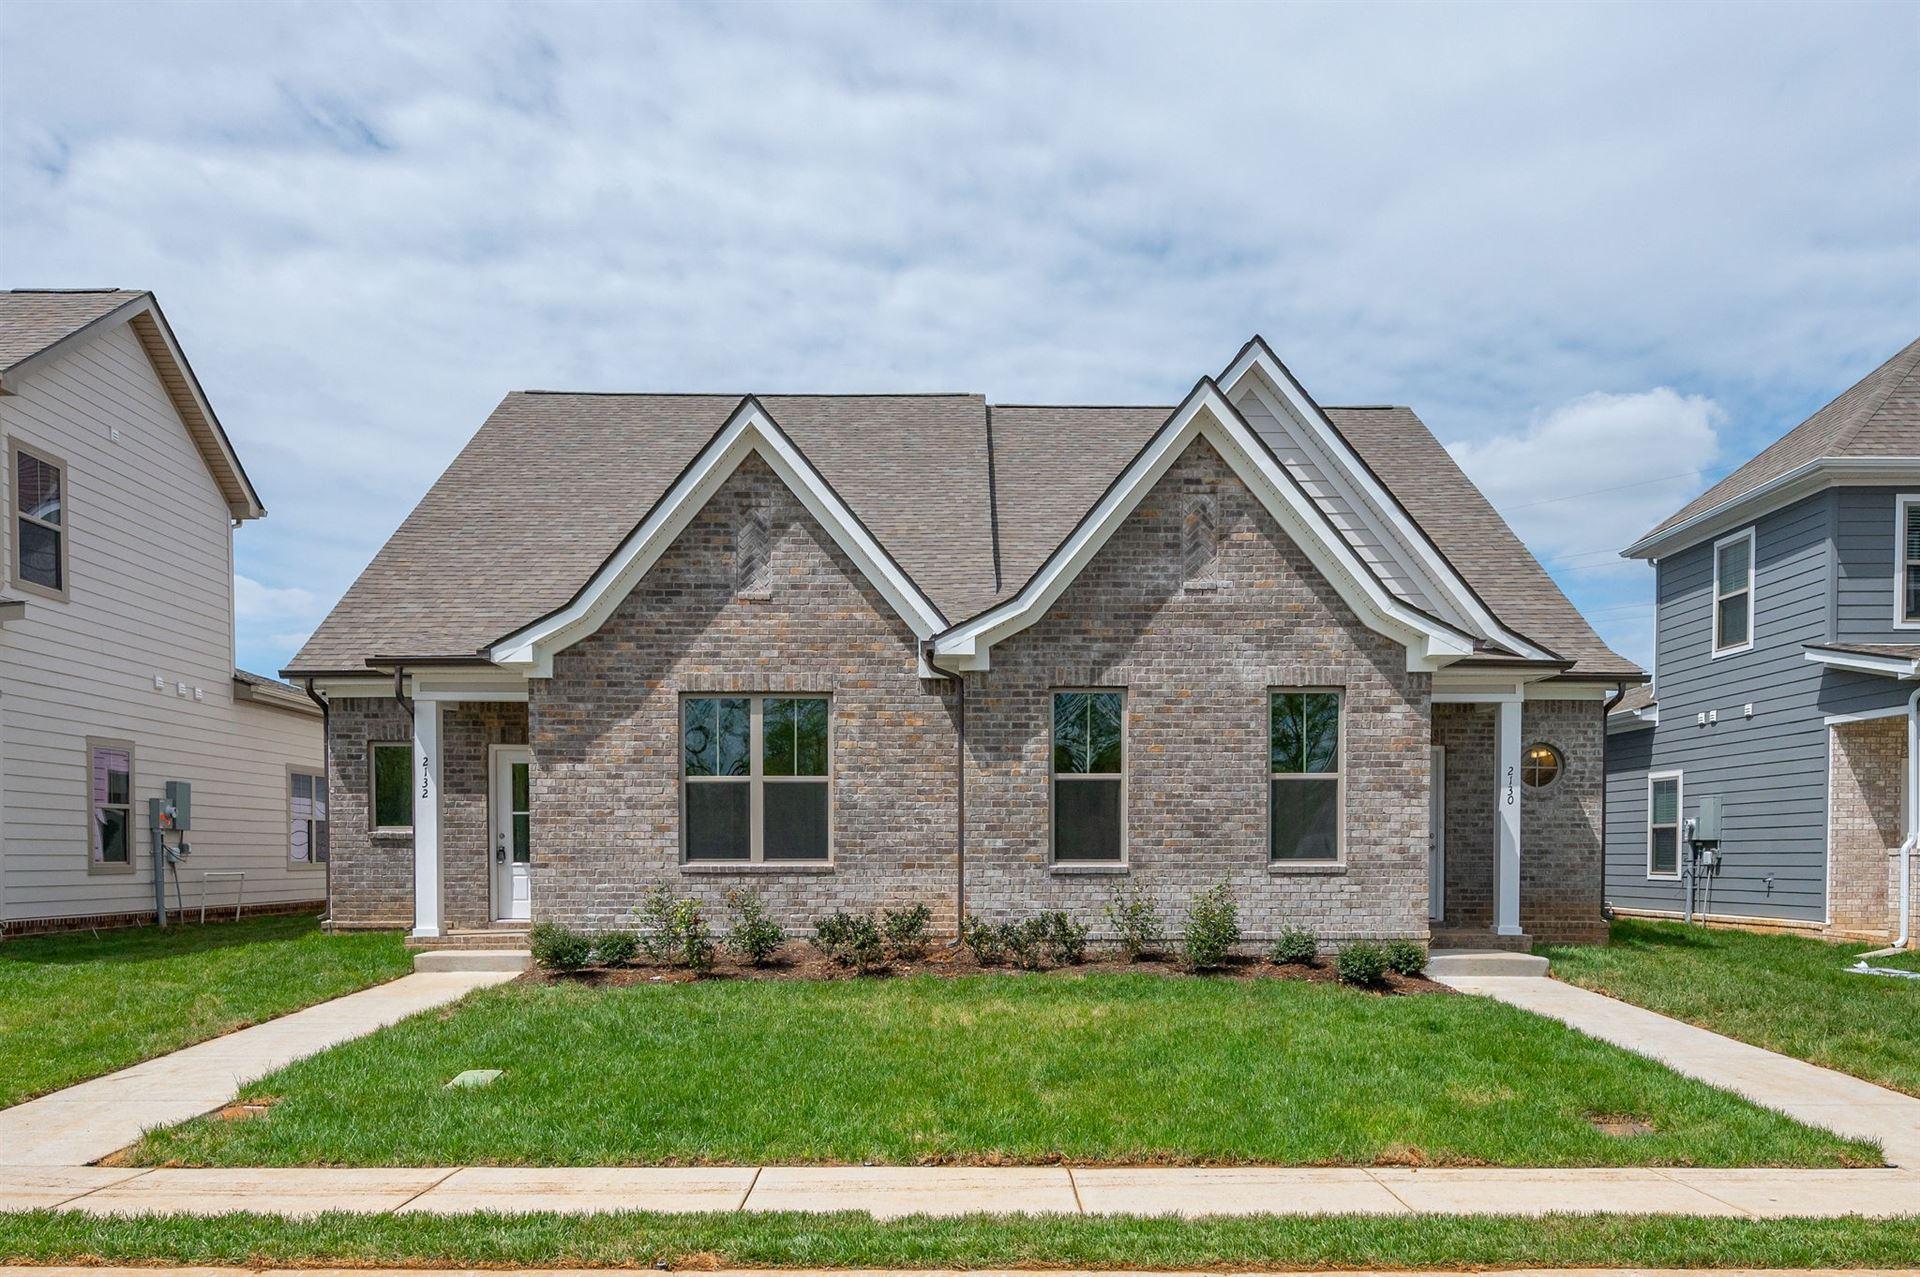 2142 Hospitality Lane, Murfreesboro, TN 37128 - MLS#: 2145031